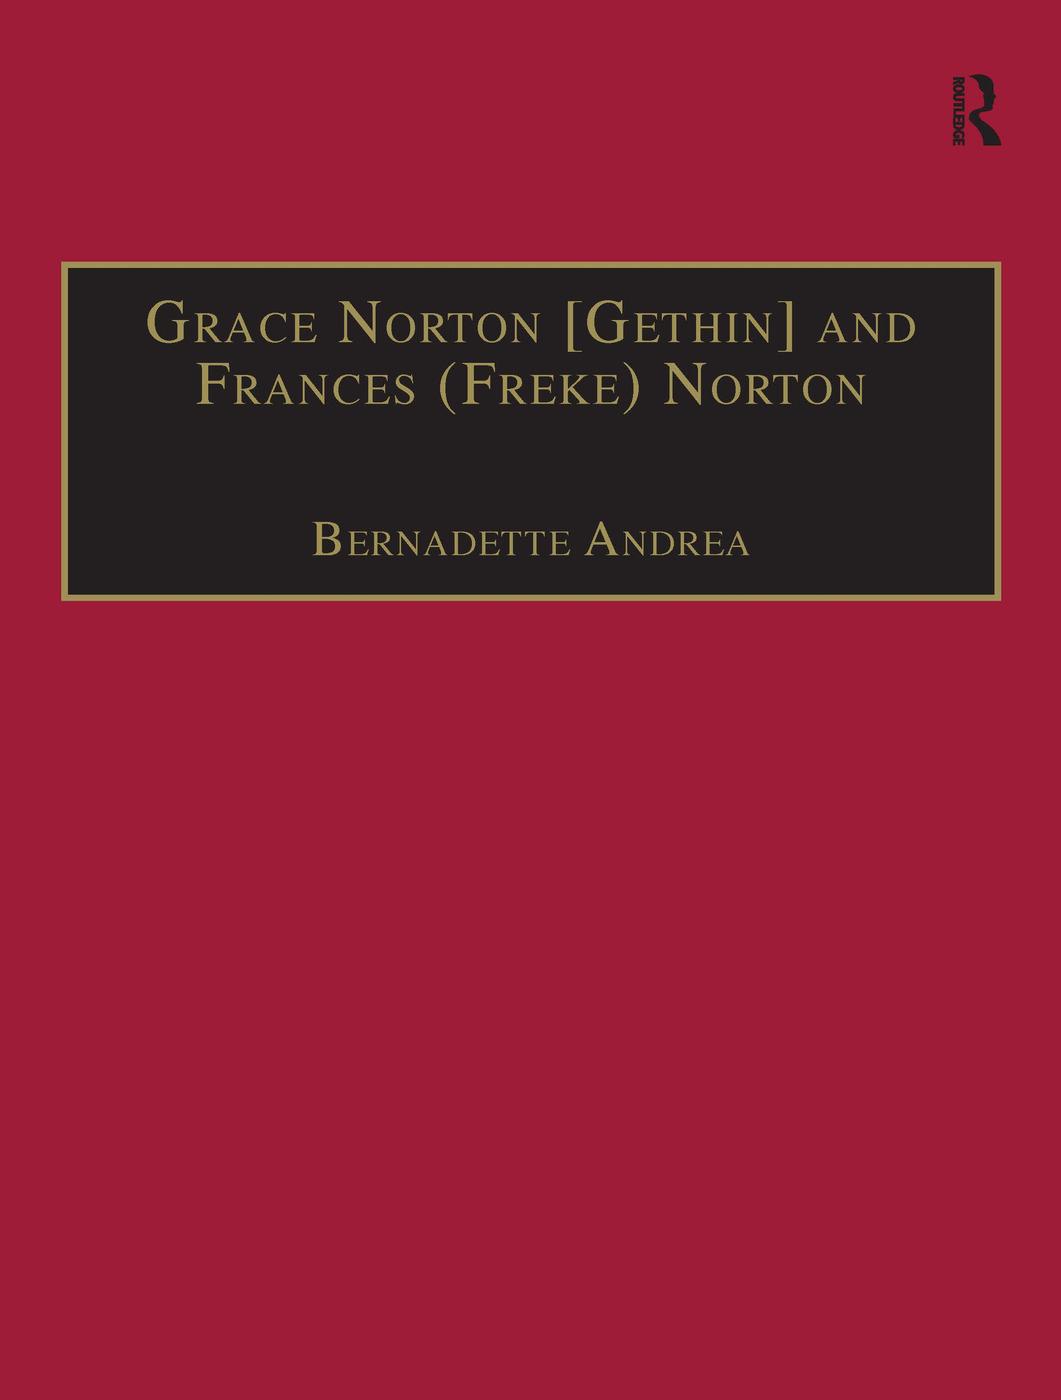 Grace Norton [Gethin] and Frances (Freke) Norton: Printed Writings 1641–1700: Series II, Part Two, Volume 9, 1st Edition (Hardback) book cover